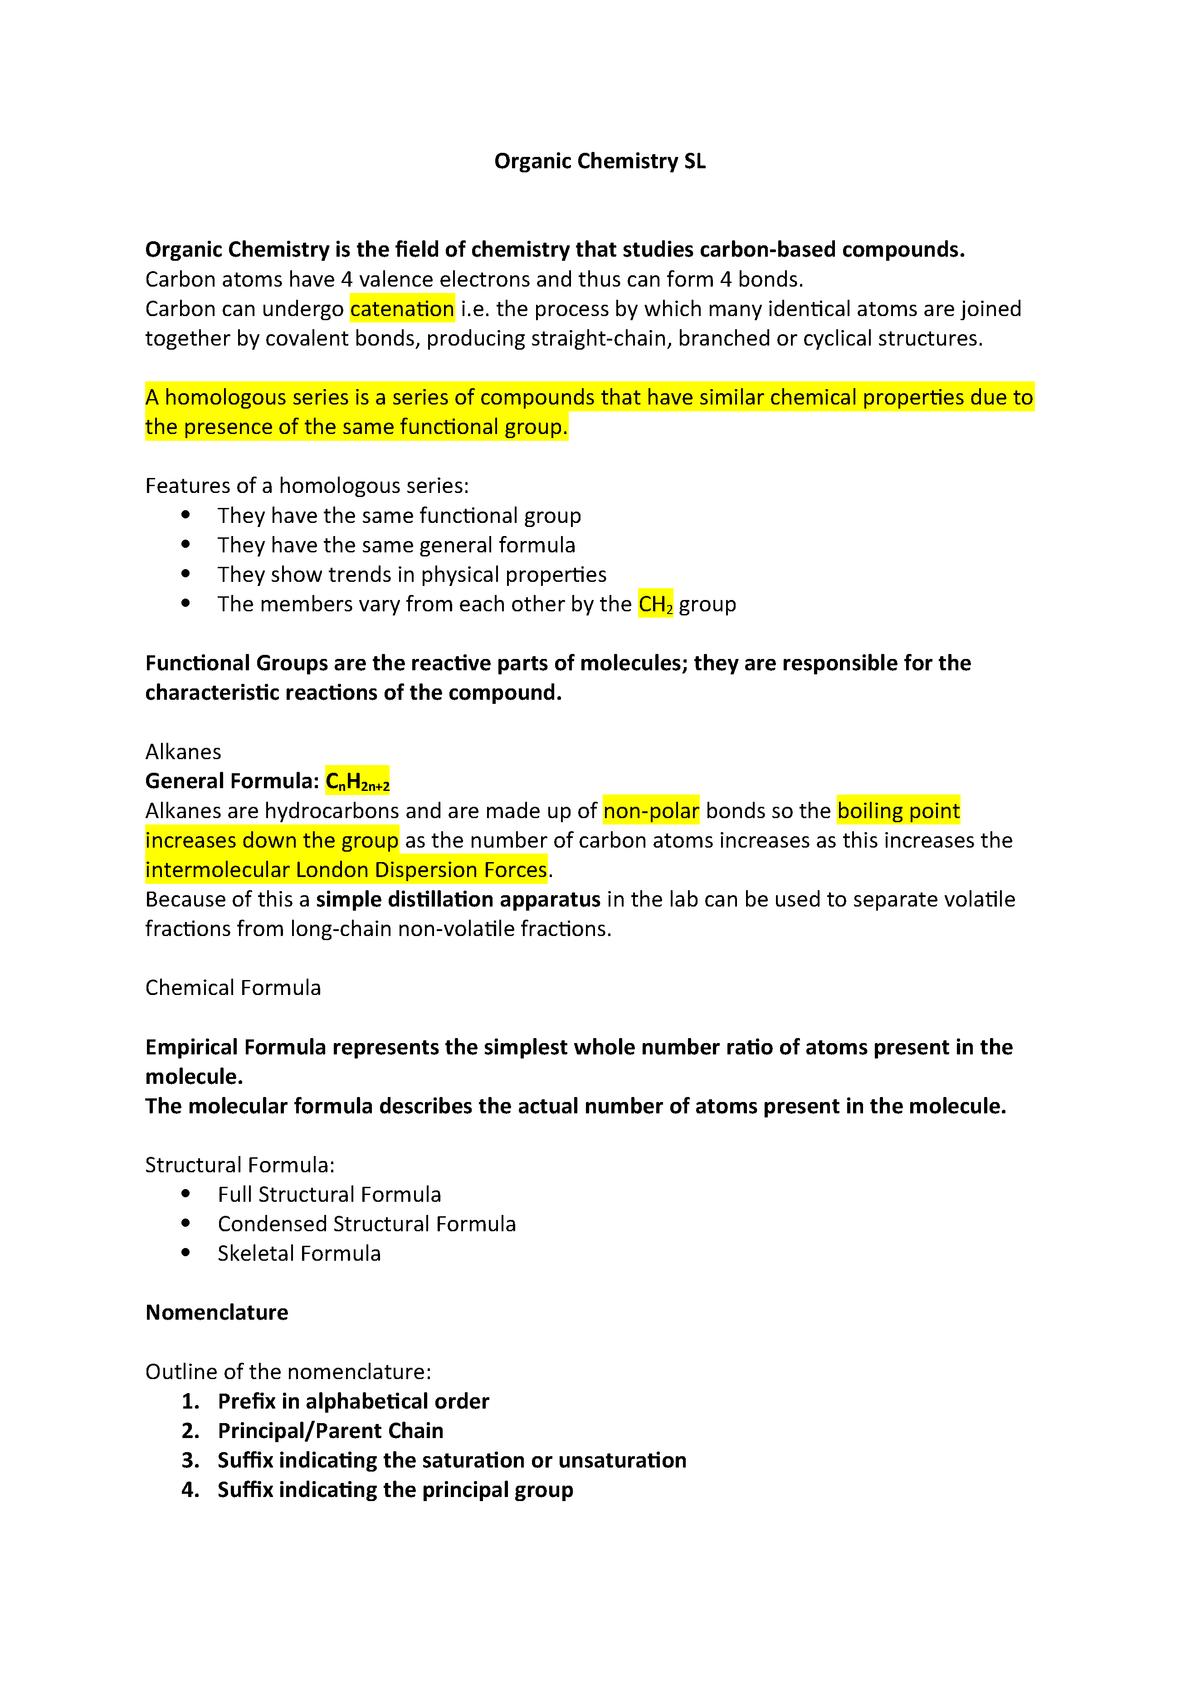 Organic Chemistry Notes - CHEM 31L - Duke University - StuDocu